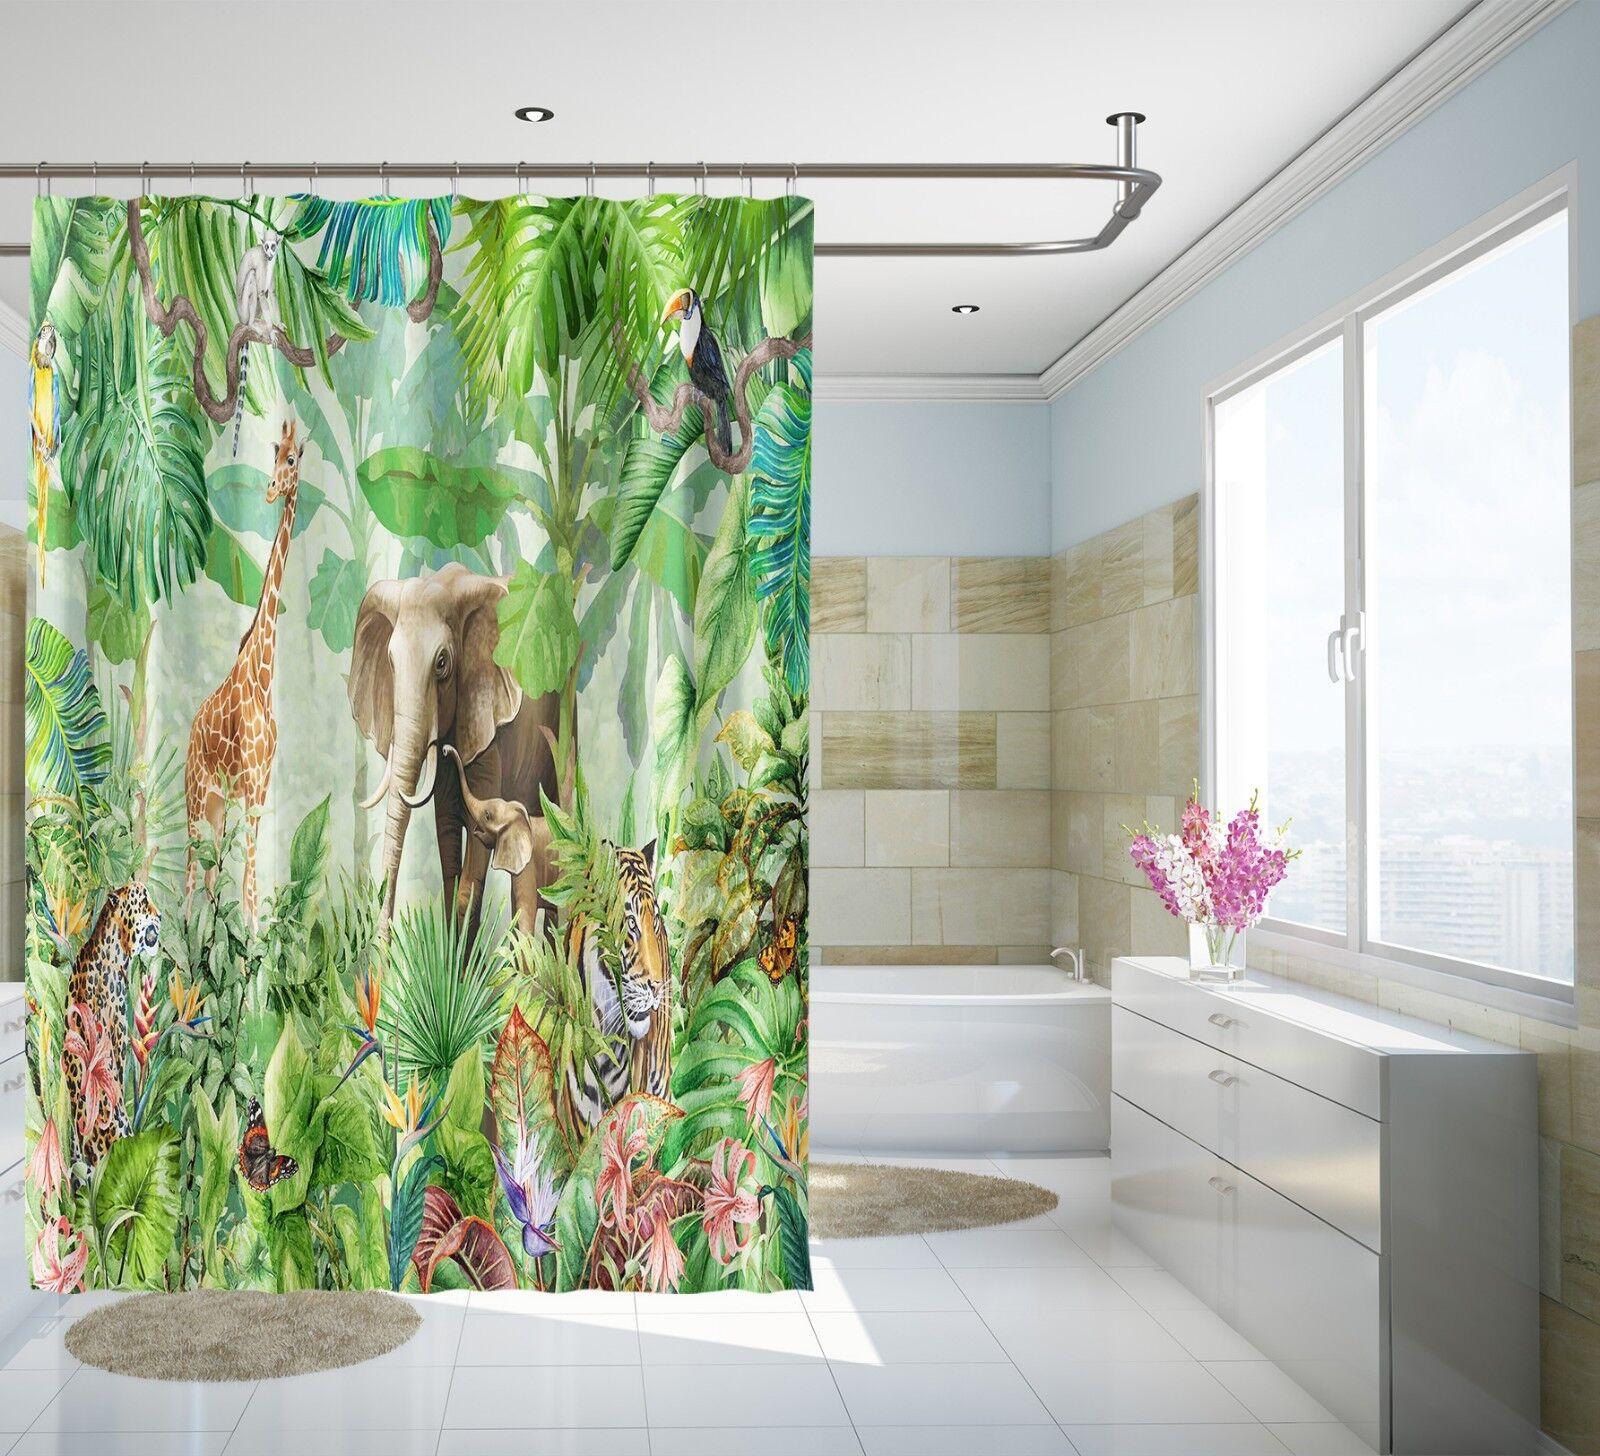 3D Tier Grün Wald 8 Duschvorhang Wasserdicht Faser Bad Daheim Windows Toilette